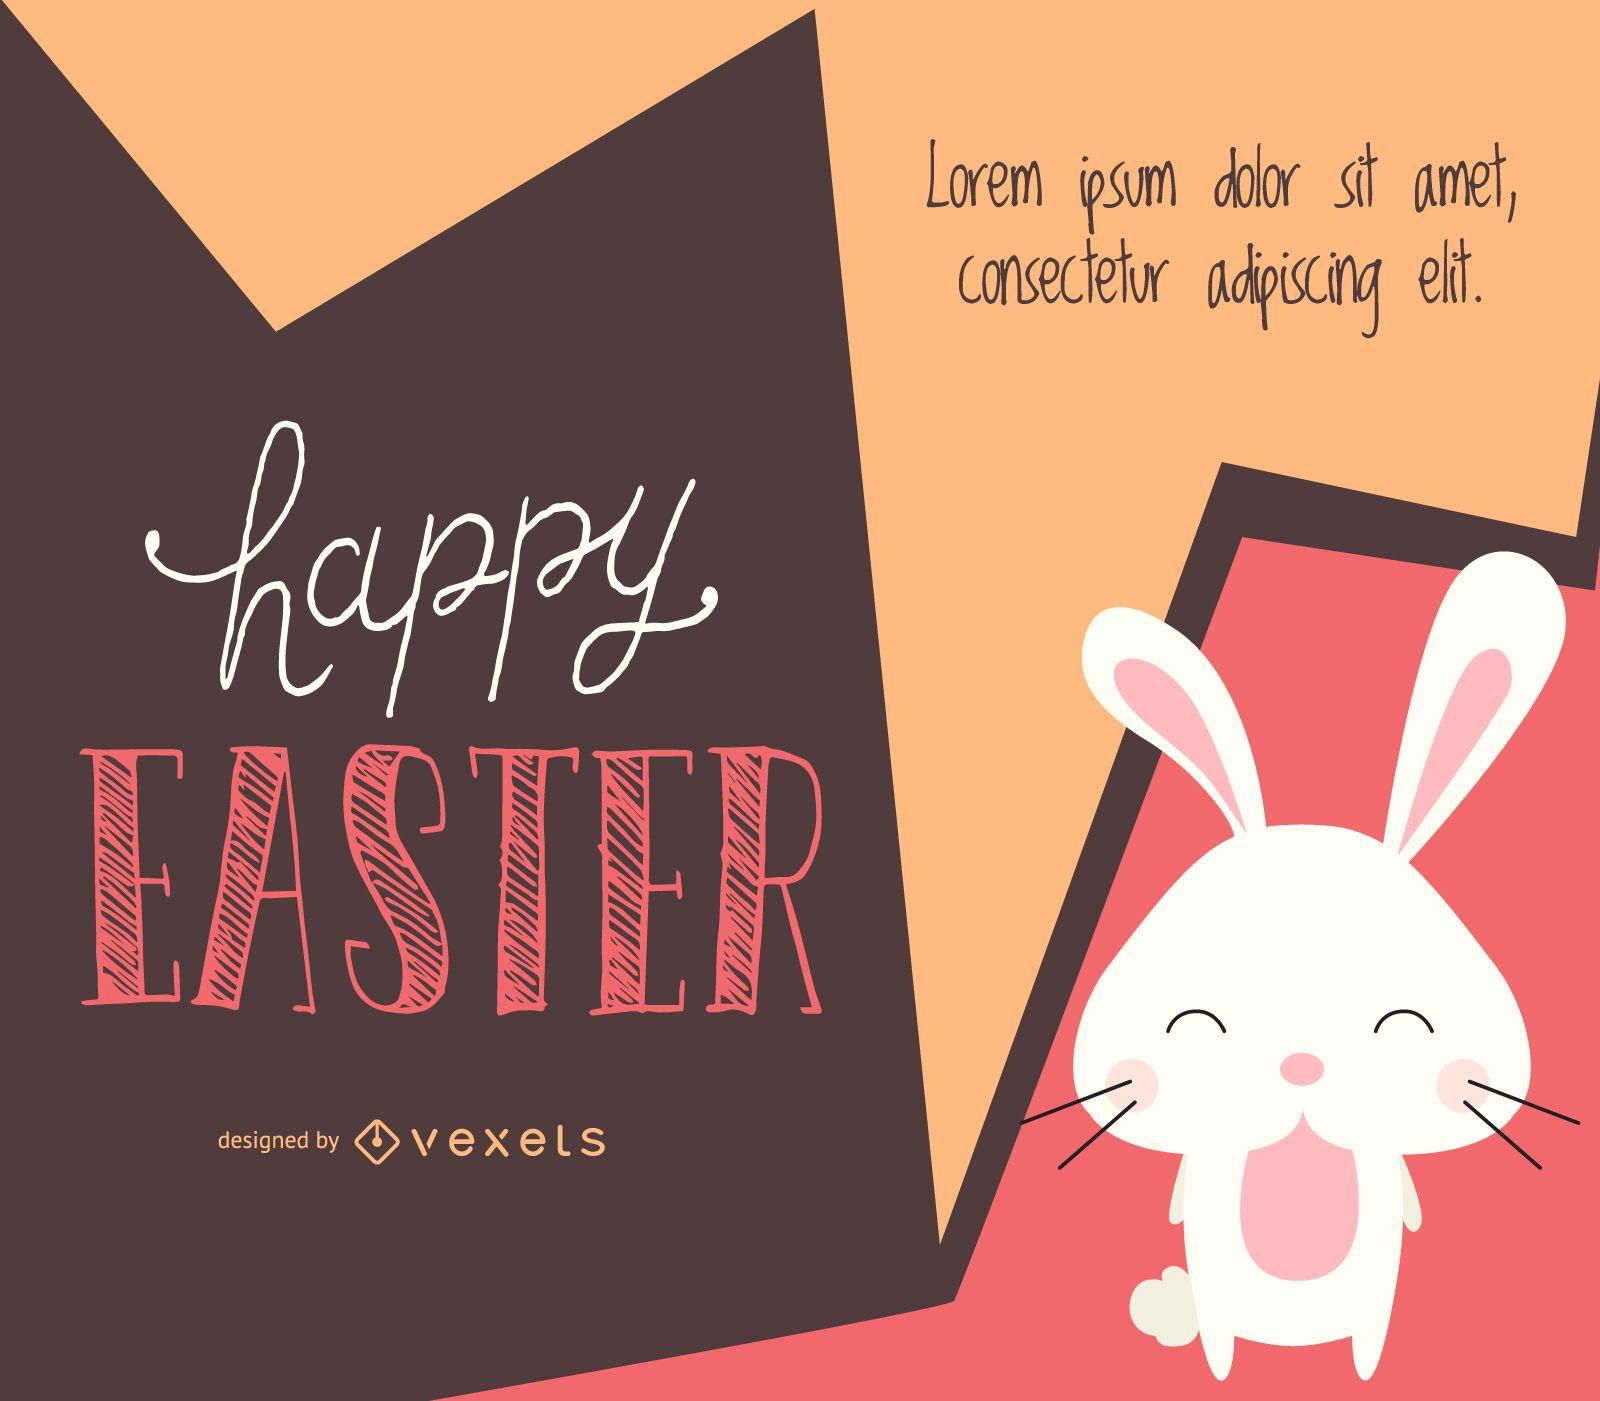 Diseño de Pascua con conejito ilustrado.